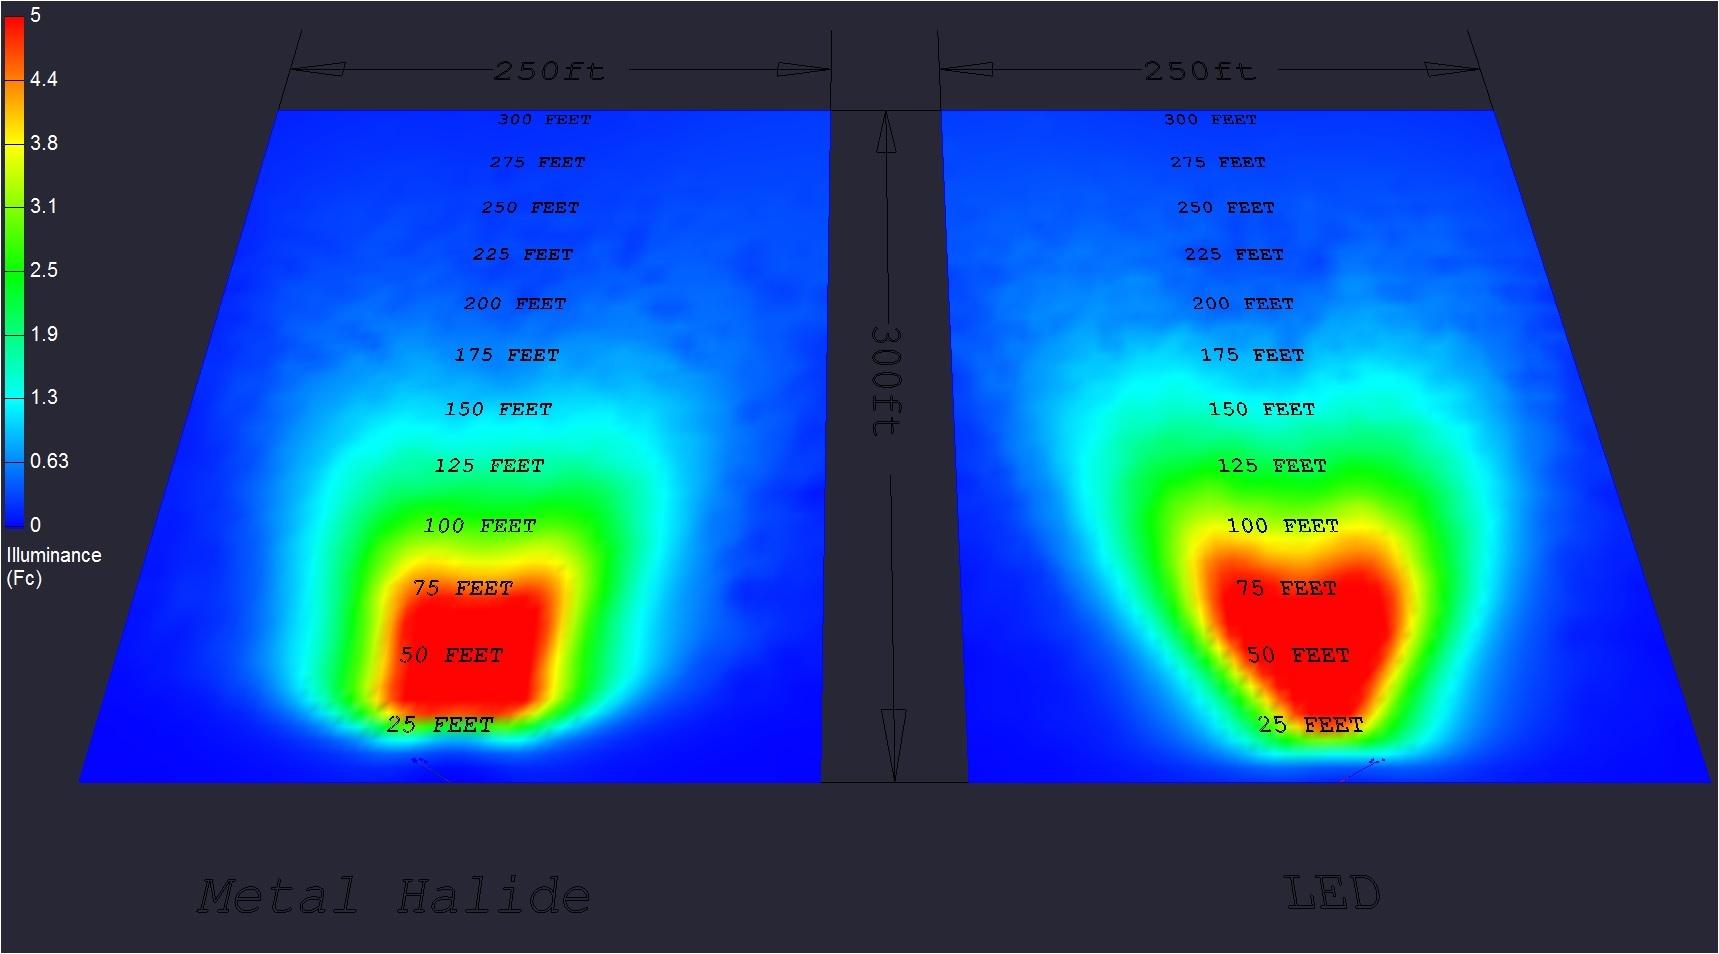 led light plant comparison to metal halide